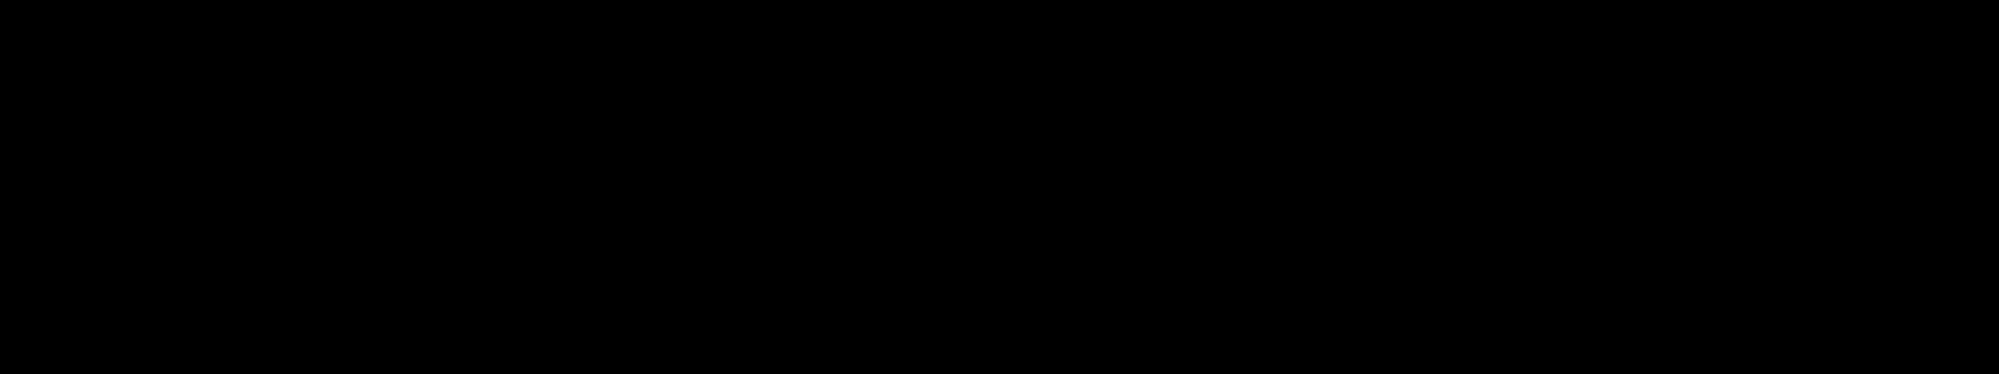 image165.png